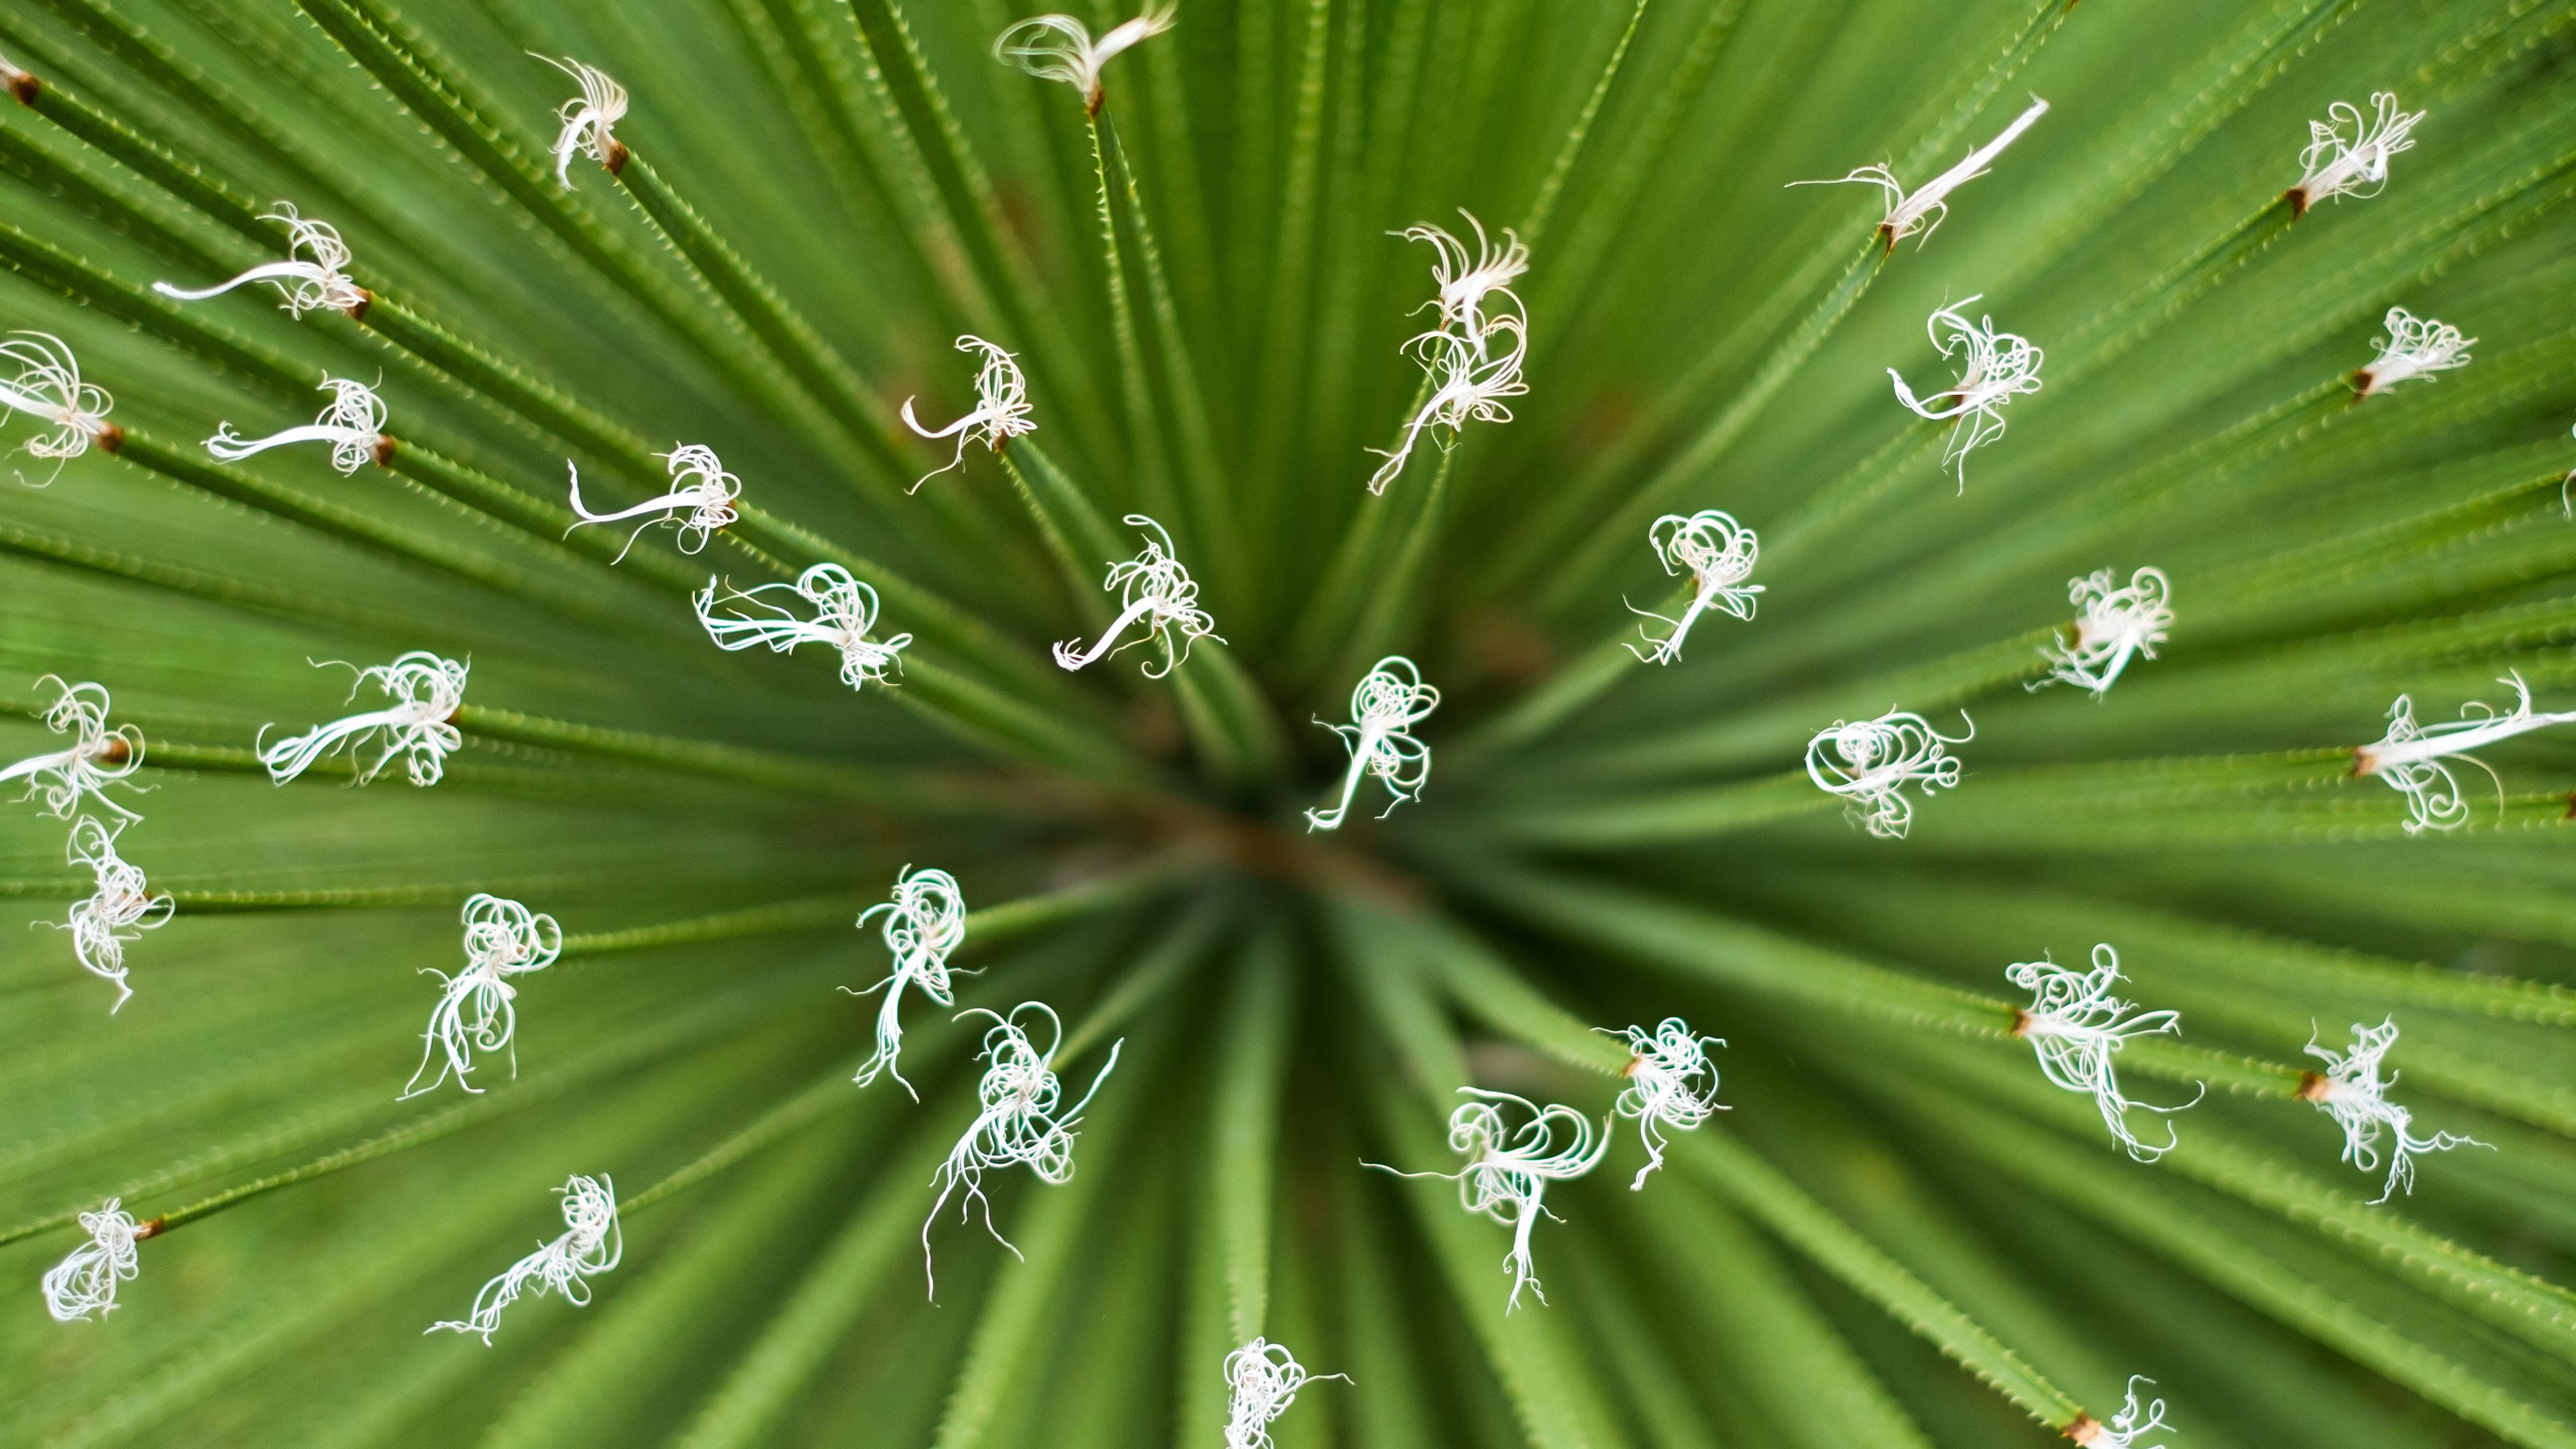 wuschenpflanze (Copy)